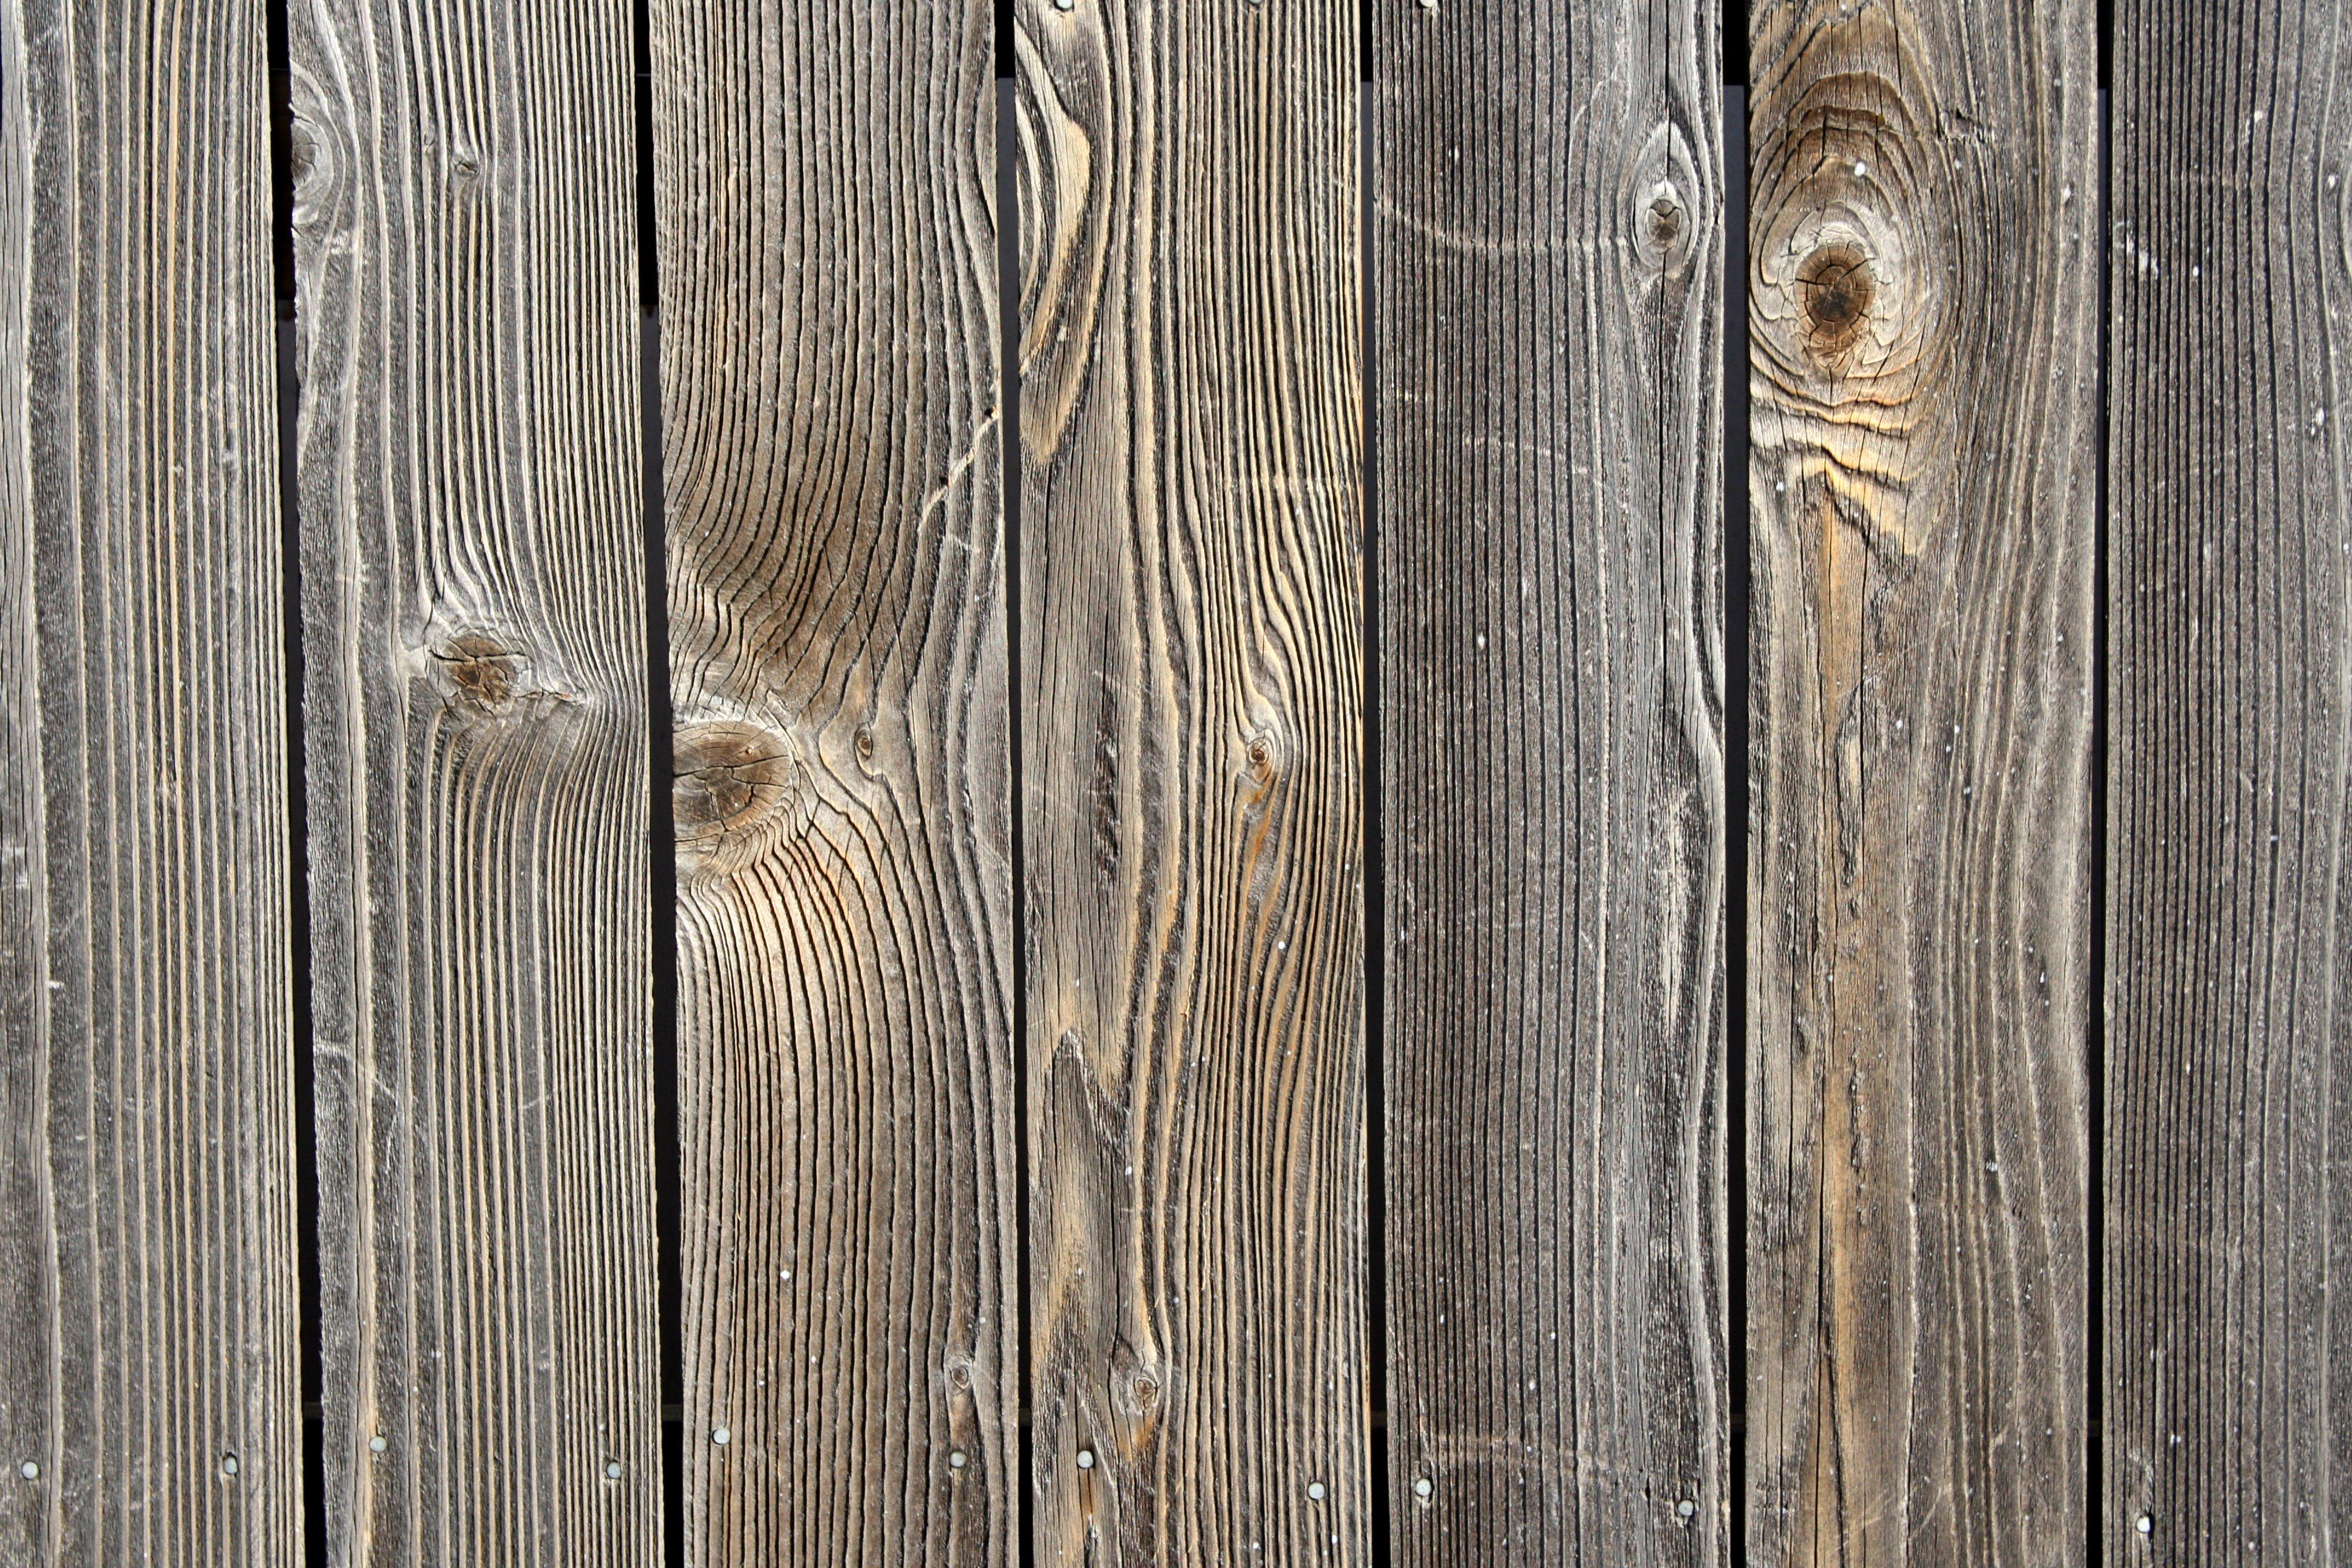 Barn wood desktop wallpaper wallpapersafari for Where to buy old barn wood